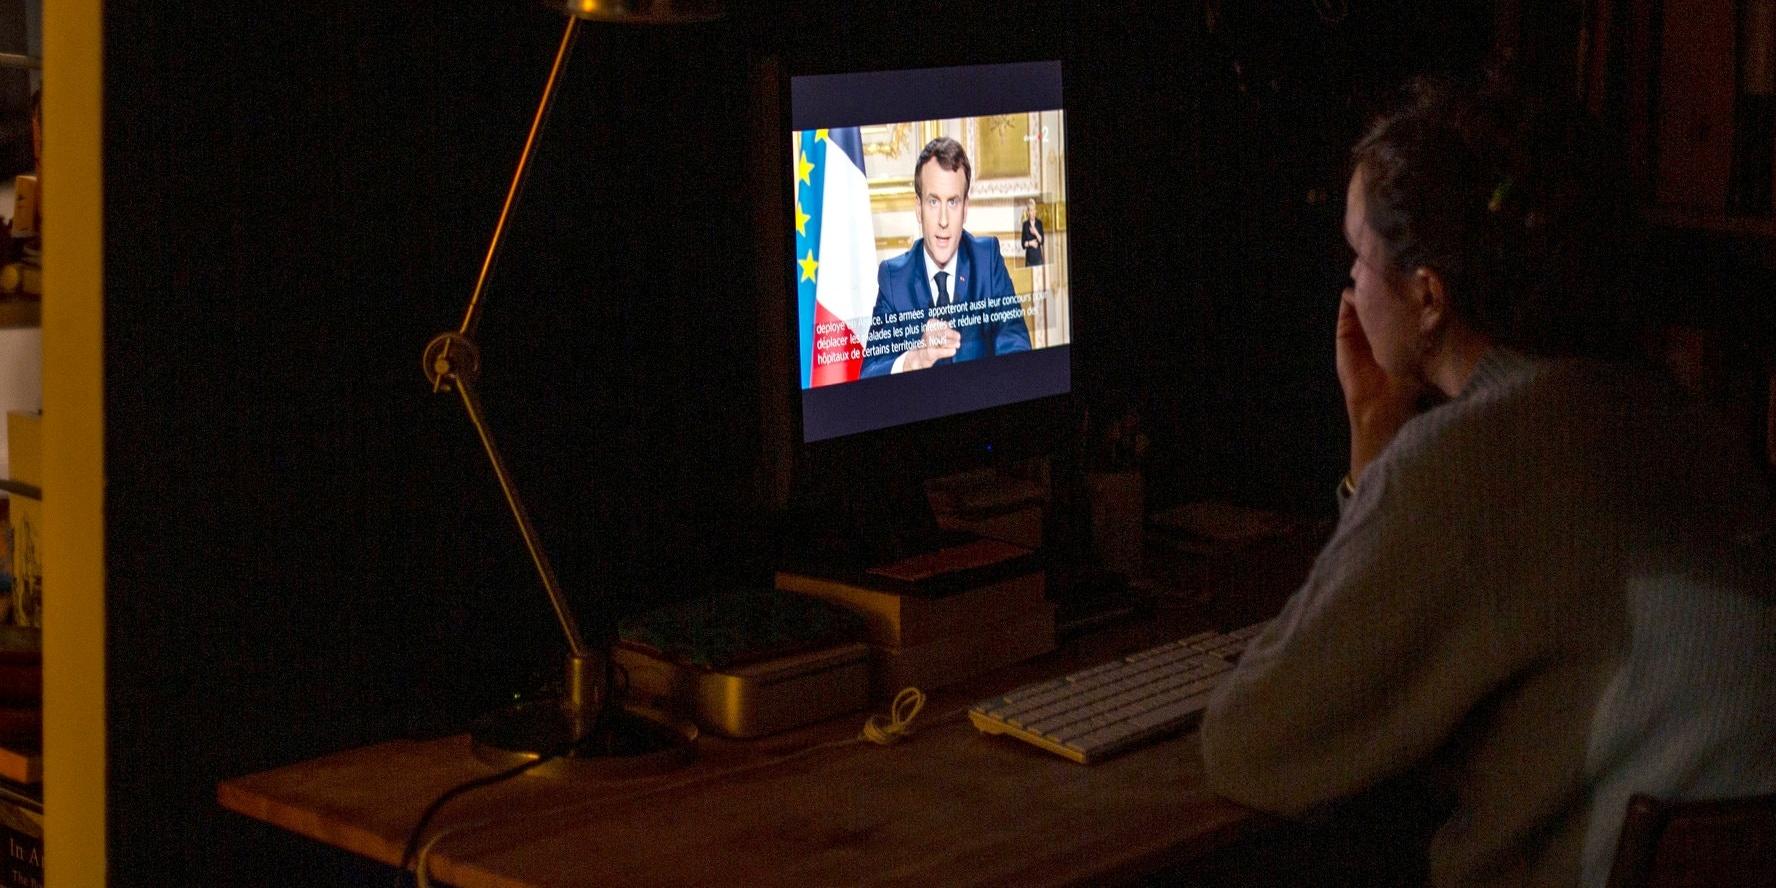 Pronunciamento do presidente francês Emmanuel Macron.